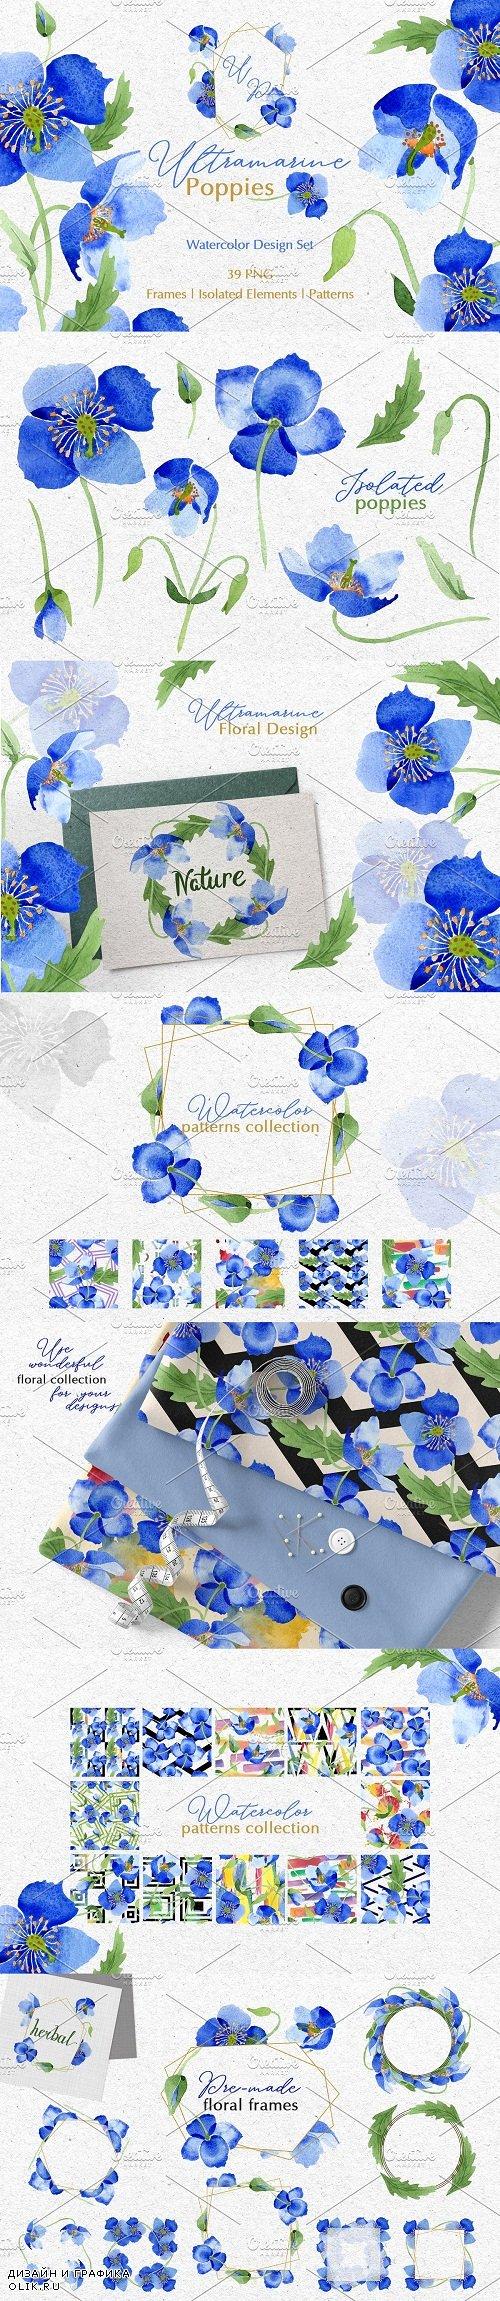 Ultramarine blue Poppies Watercolor - 3739115